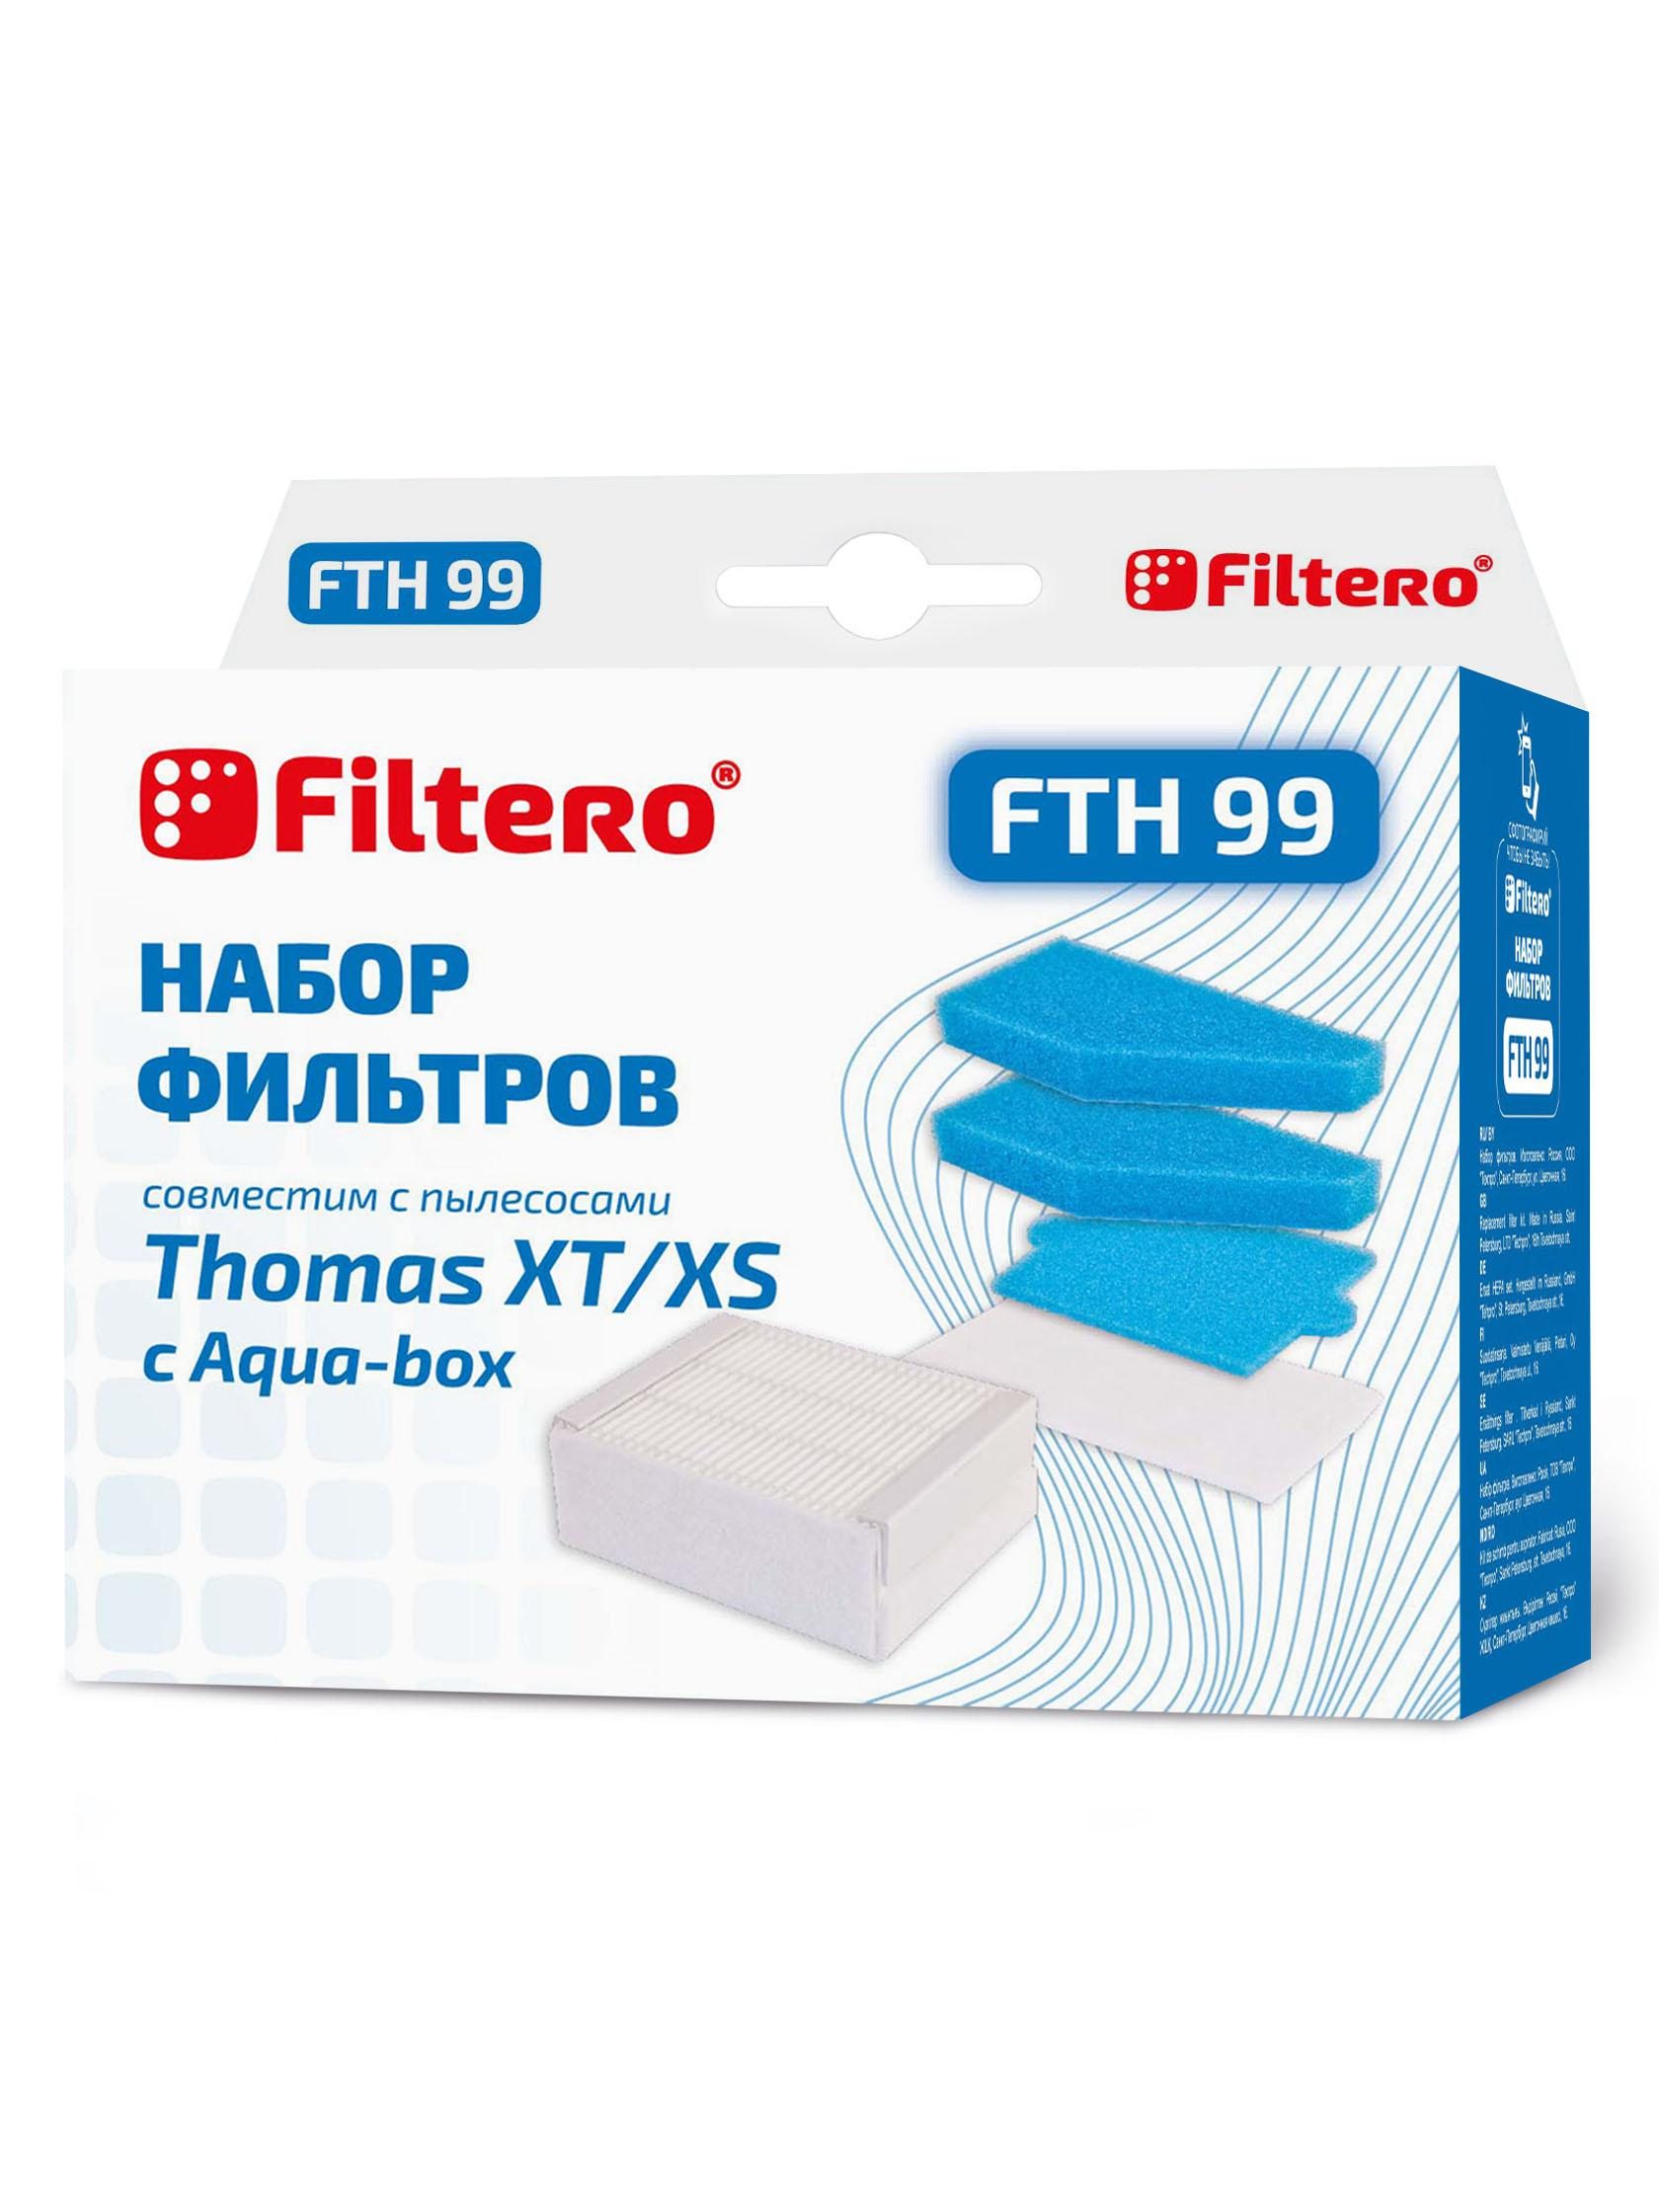 Фильтр Filtero Fth 99 tms hepa набор фильтров filtero fth 99 tms hepa для thomas xt